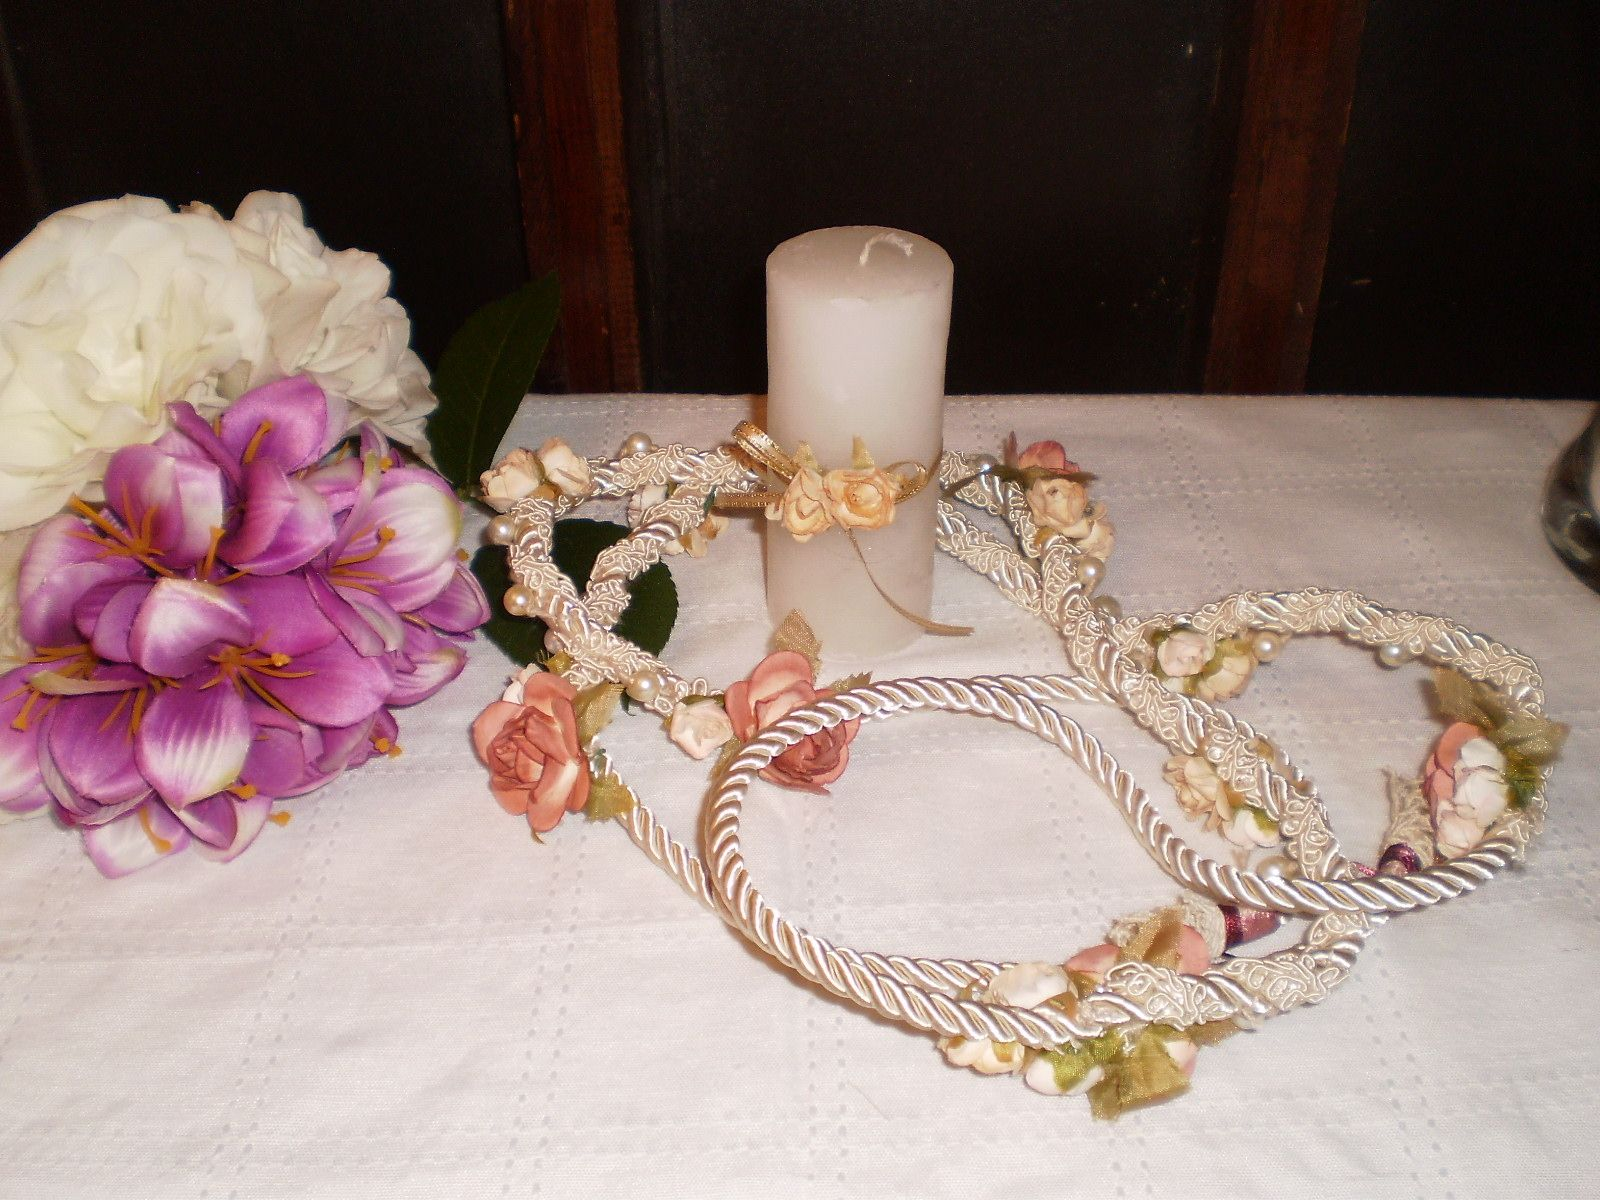 Ideas Matrimonio Simbolico : Lazo para el ritual de atadura manos en matrimonios